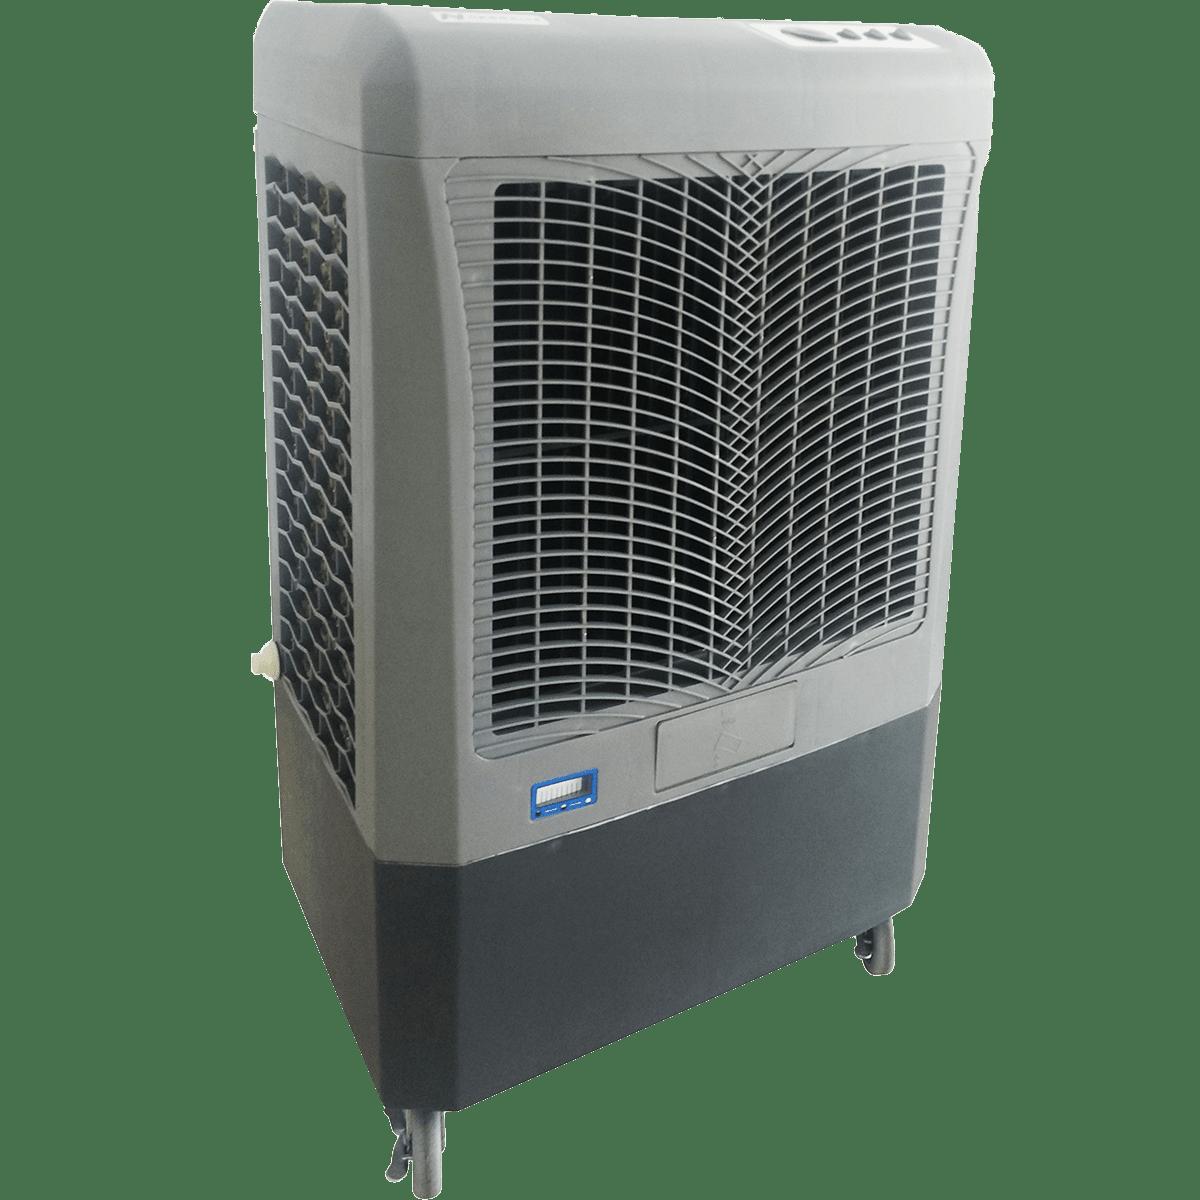 Hessaire MC37M 2,200 CFM 3-Speed Portable Evaporative Cooler he5453